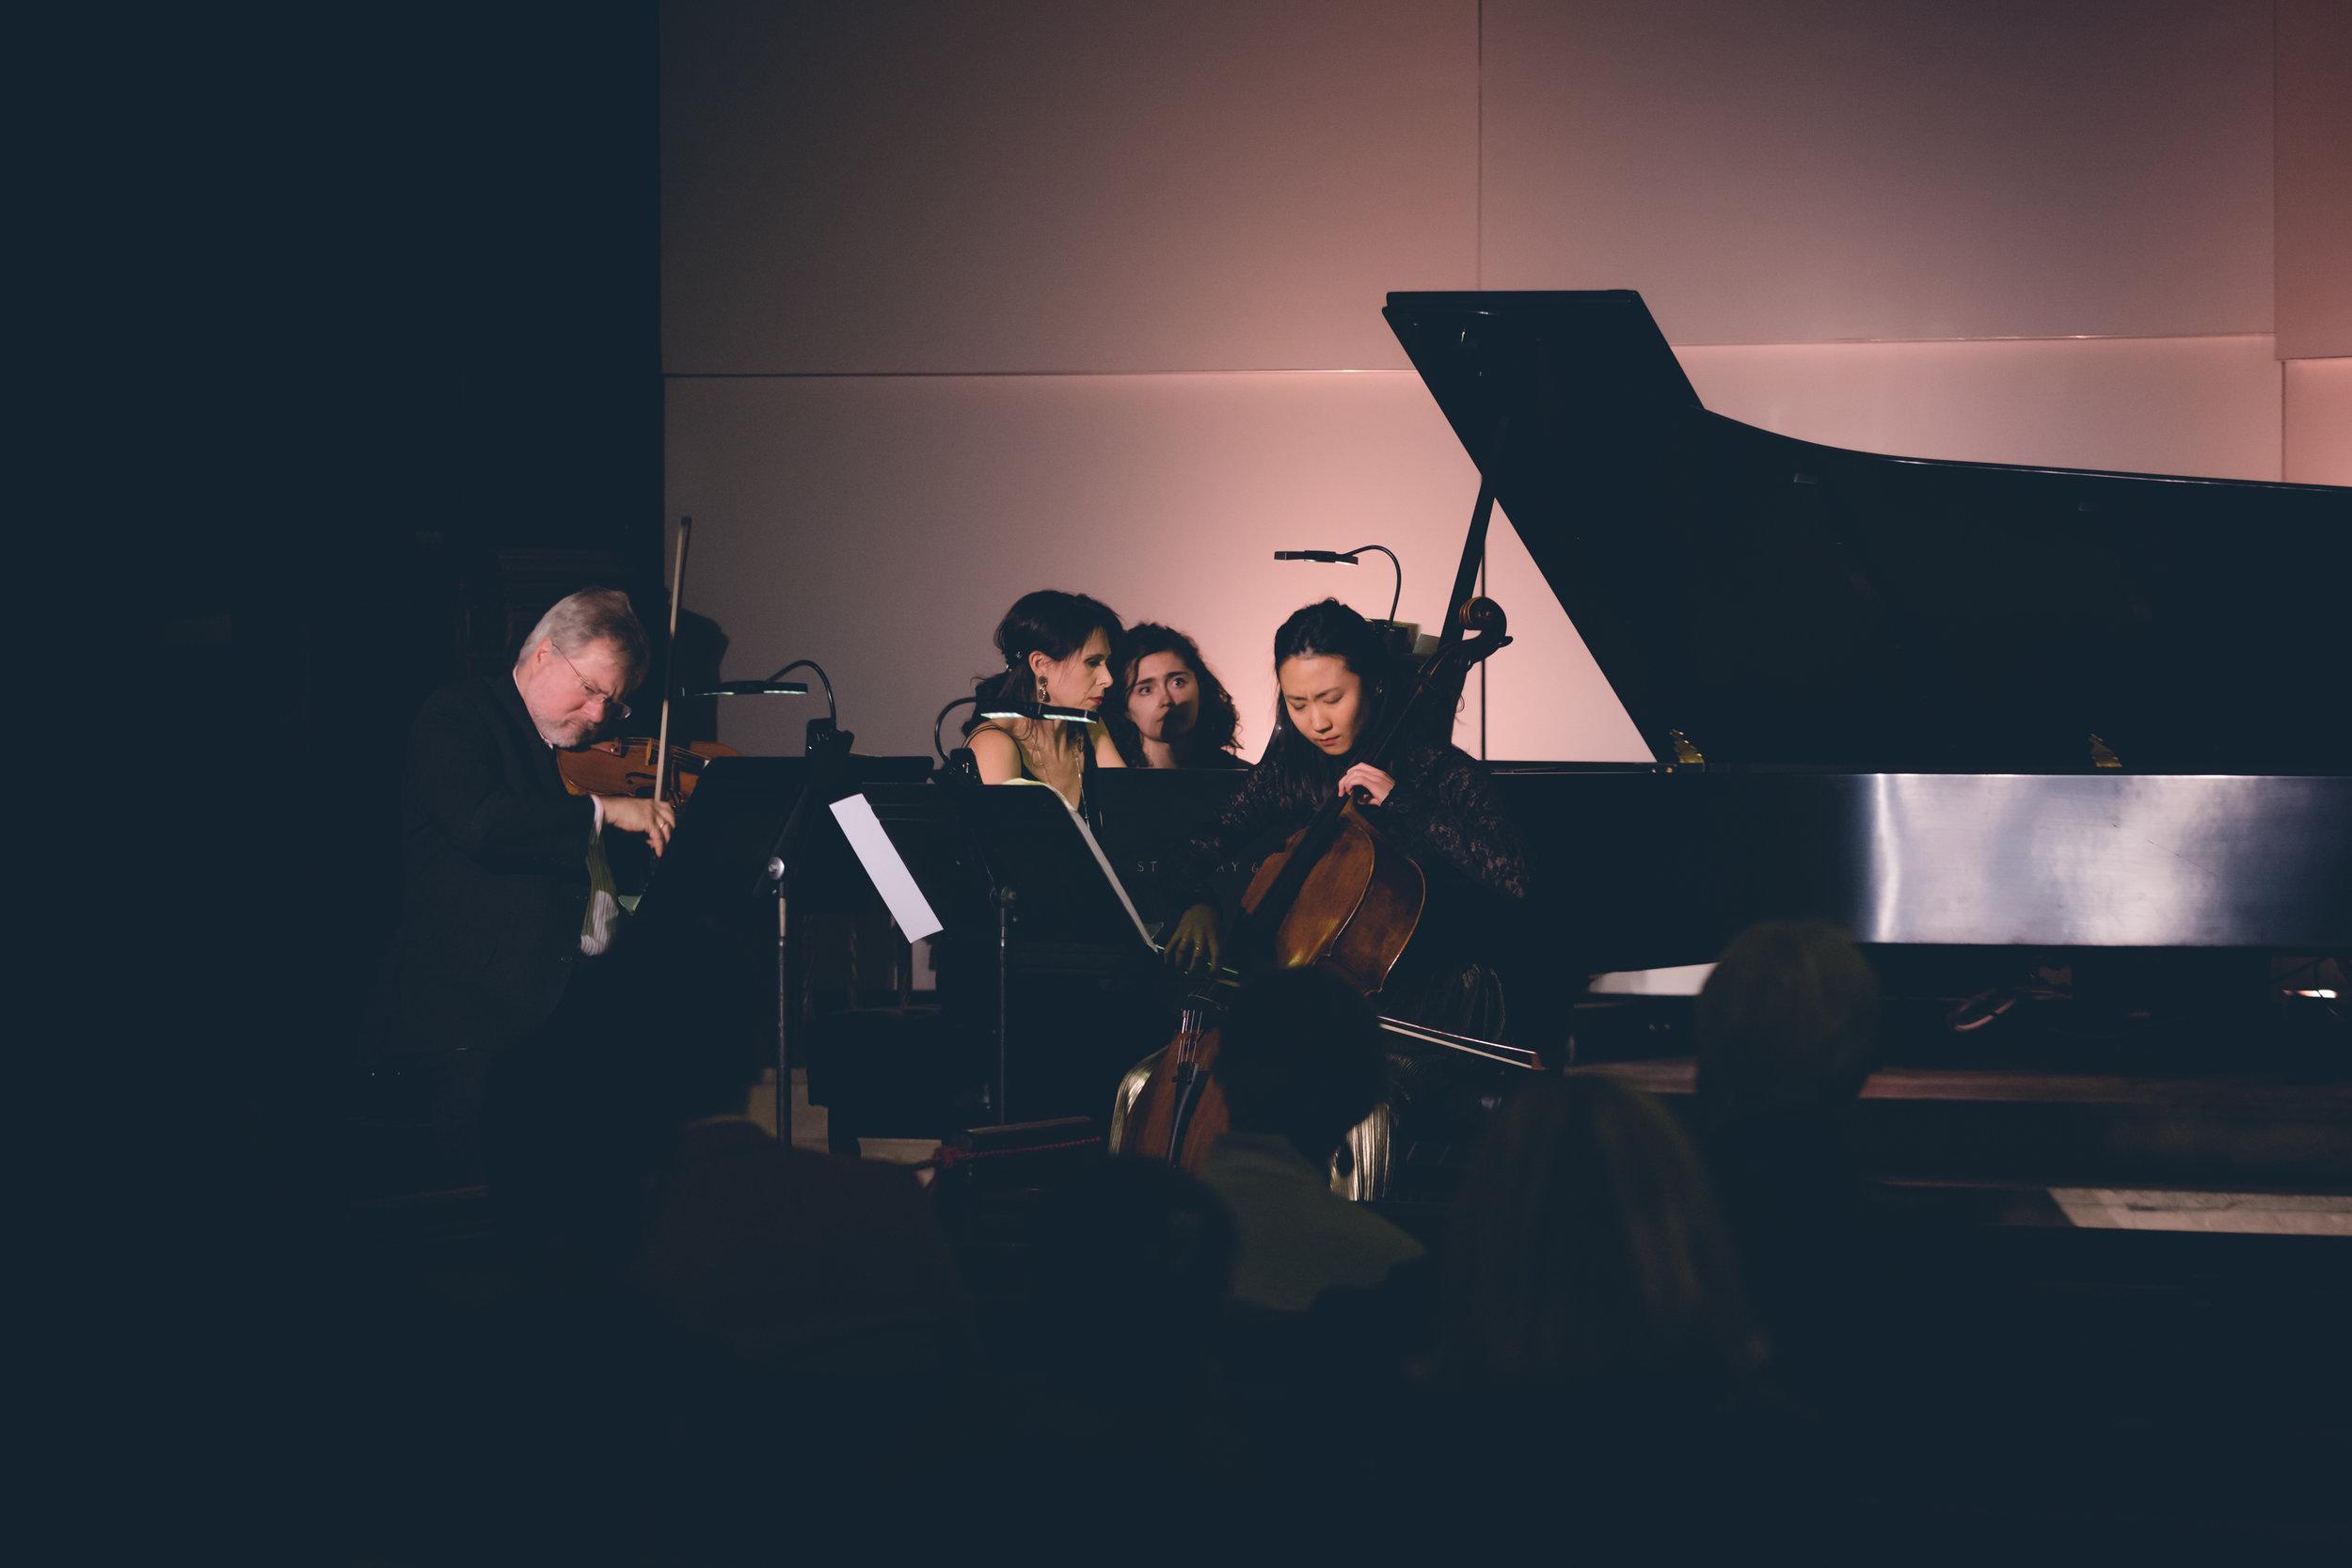 Concert_036.JPG